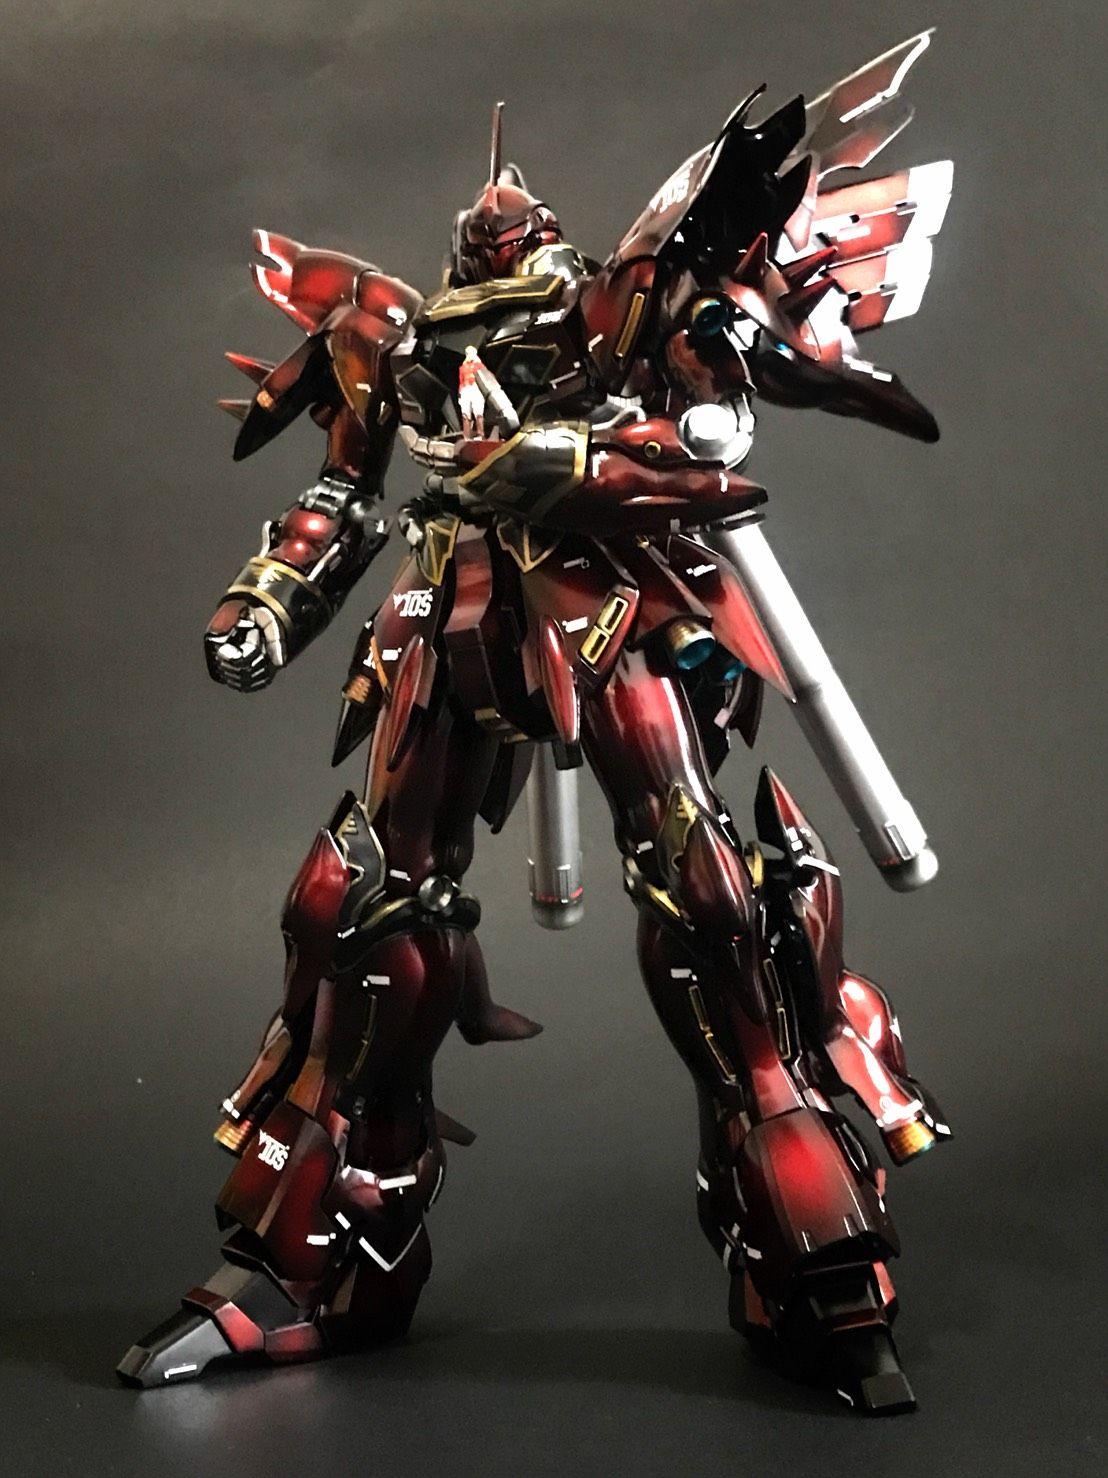 Pin by Big Bear on MG Sinanju 新安洲 Samurai gear, Sci fi